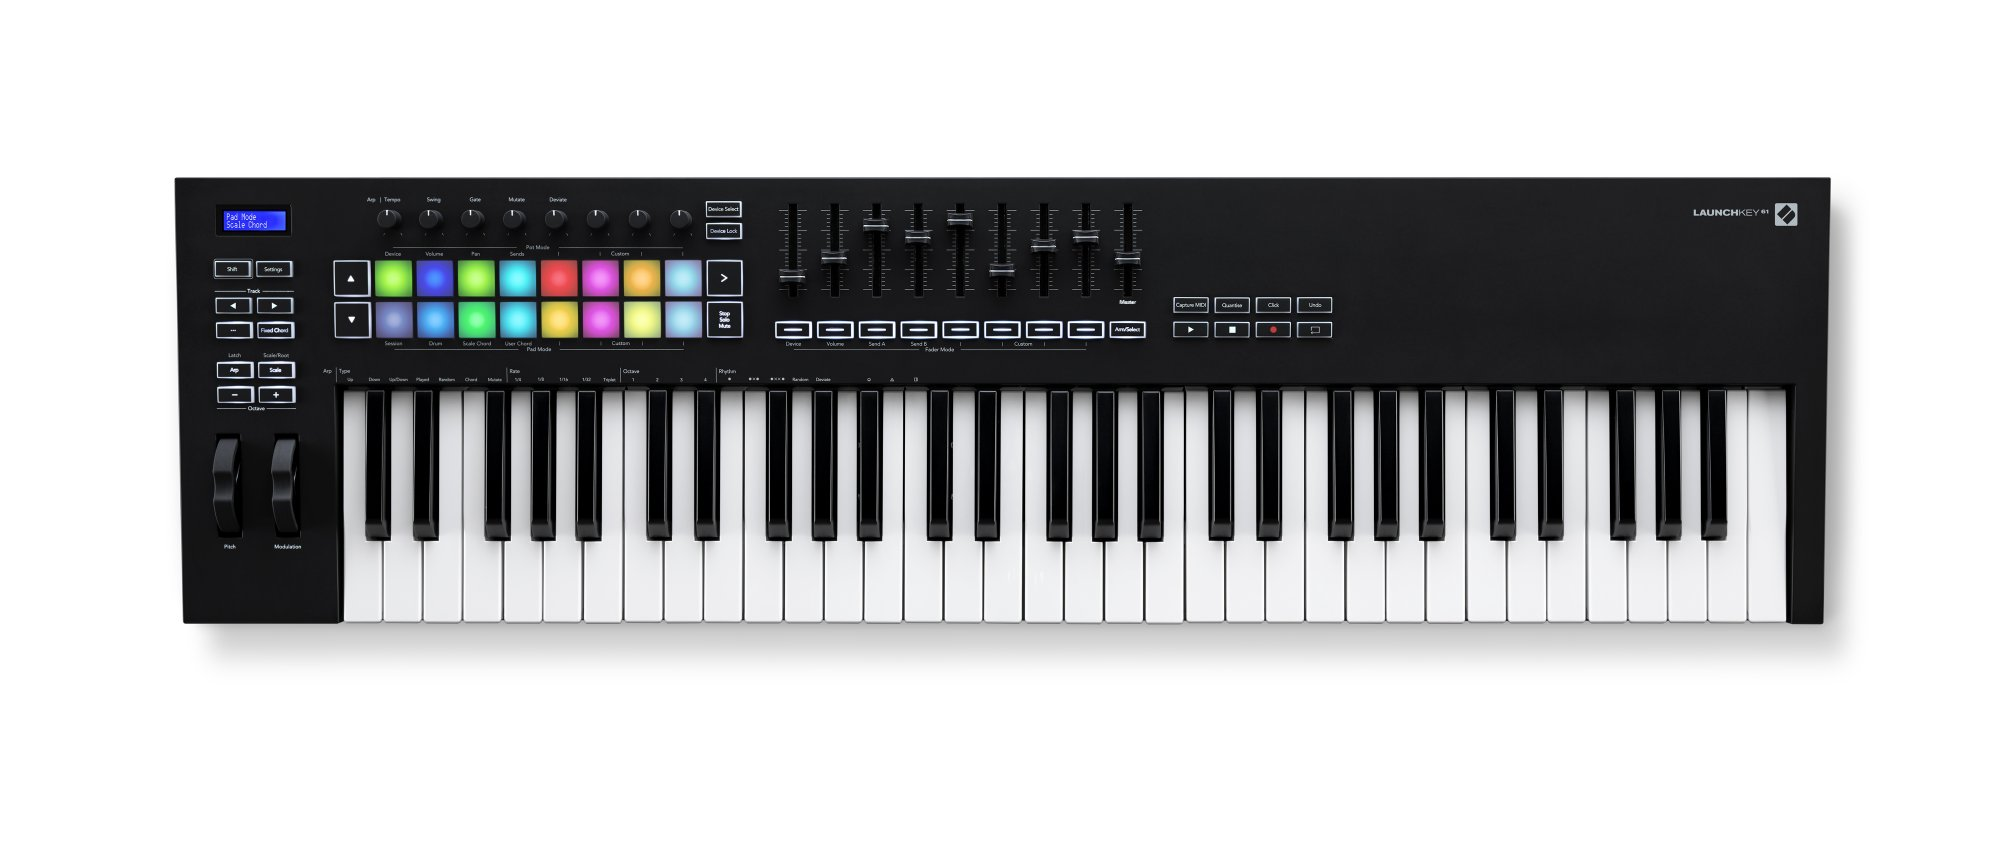 Novation Launchkey MK3 61 61-Note Keyboard Controller